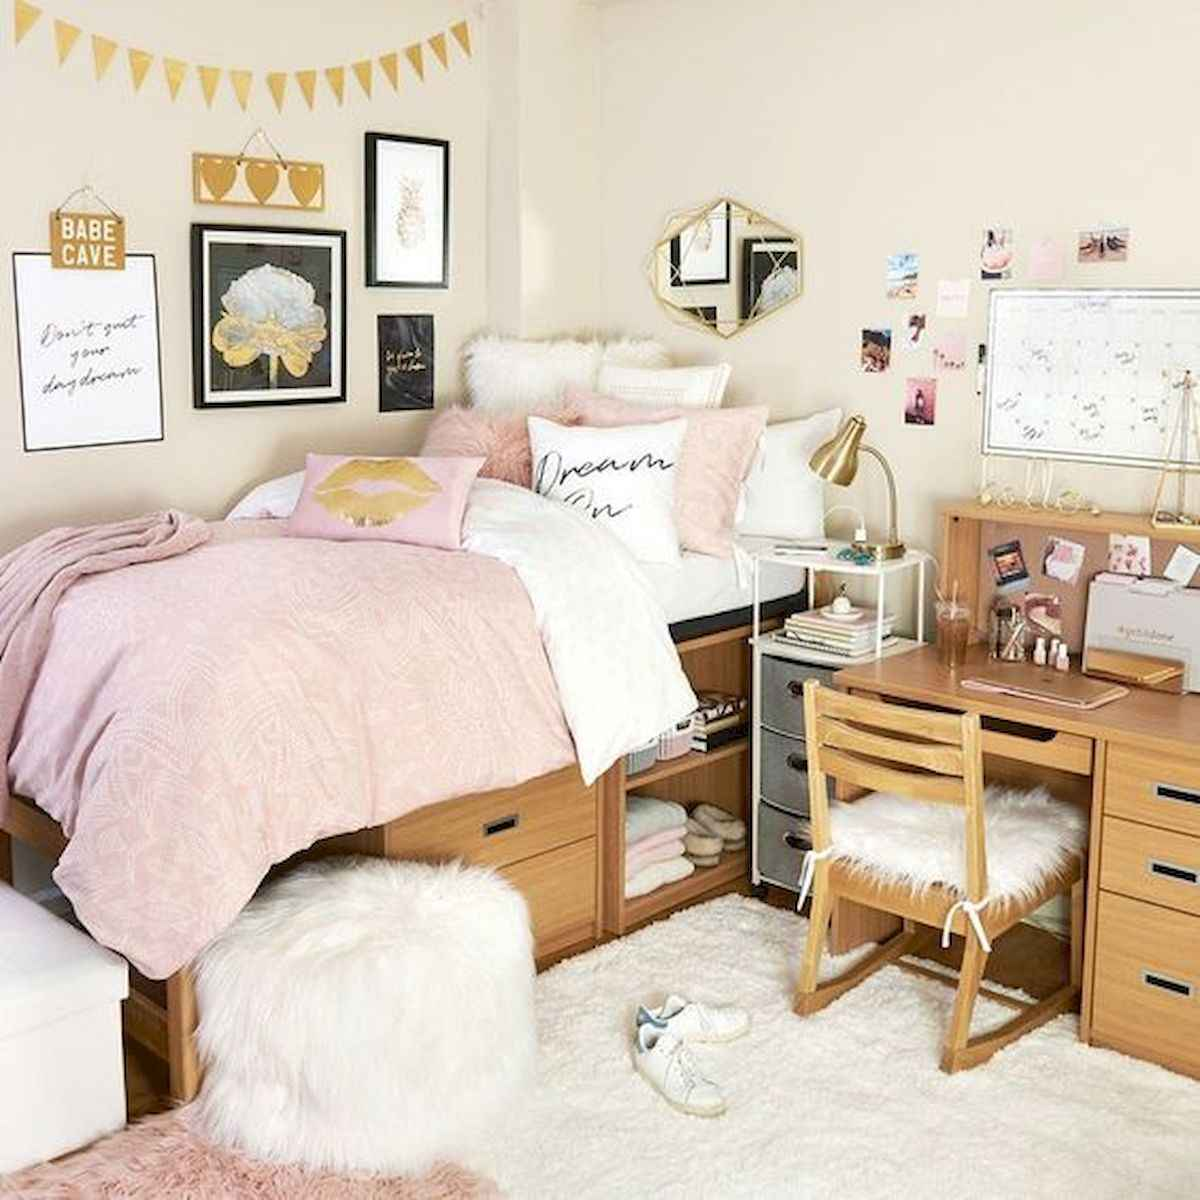 80 Fantastic Small Apartment Bedroom College Design Ideas and Decor (76)